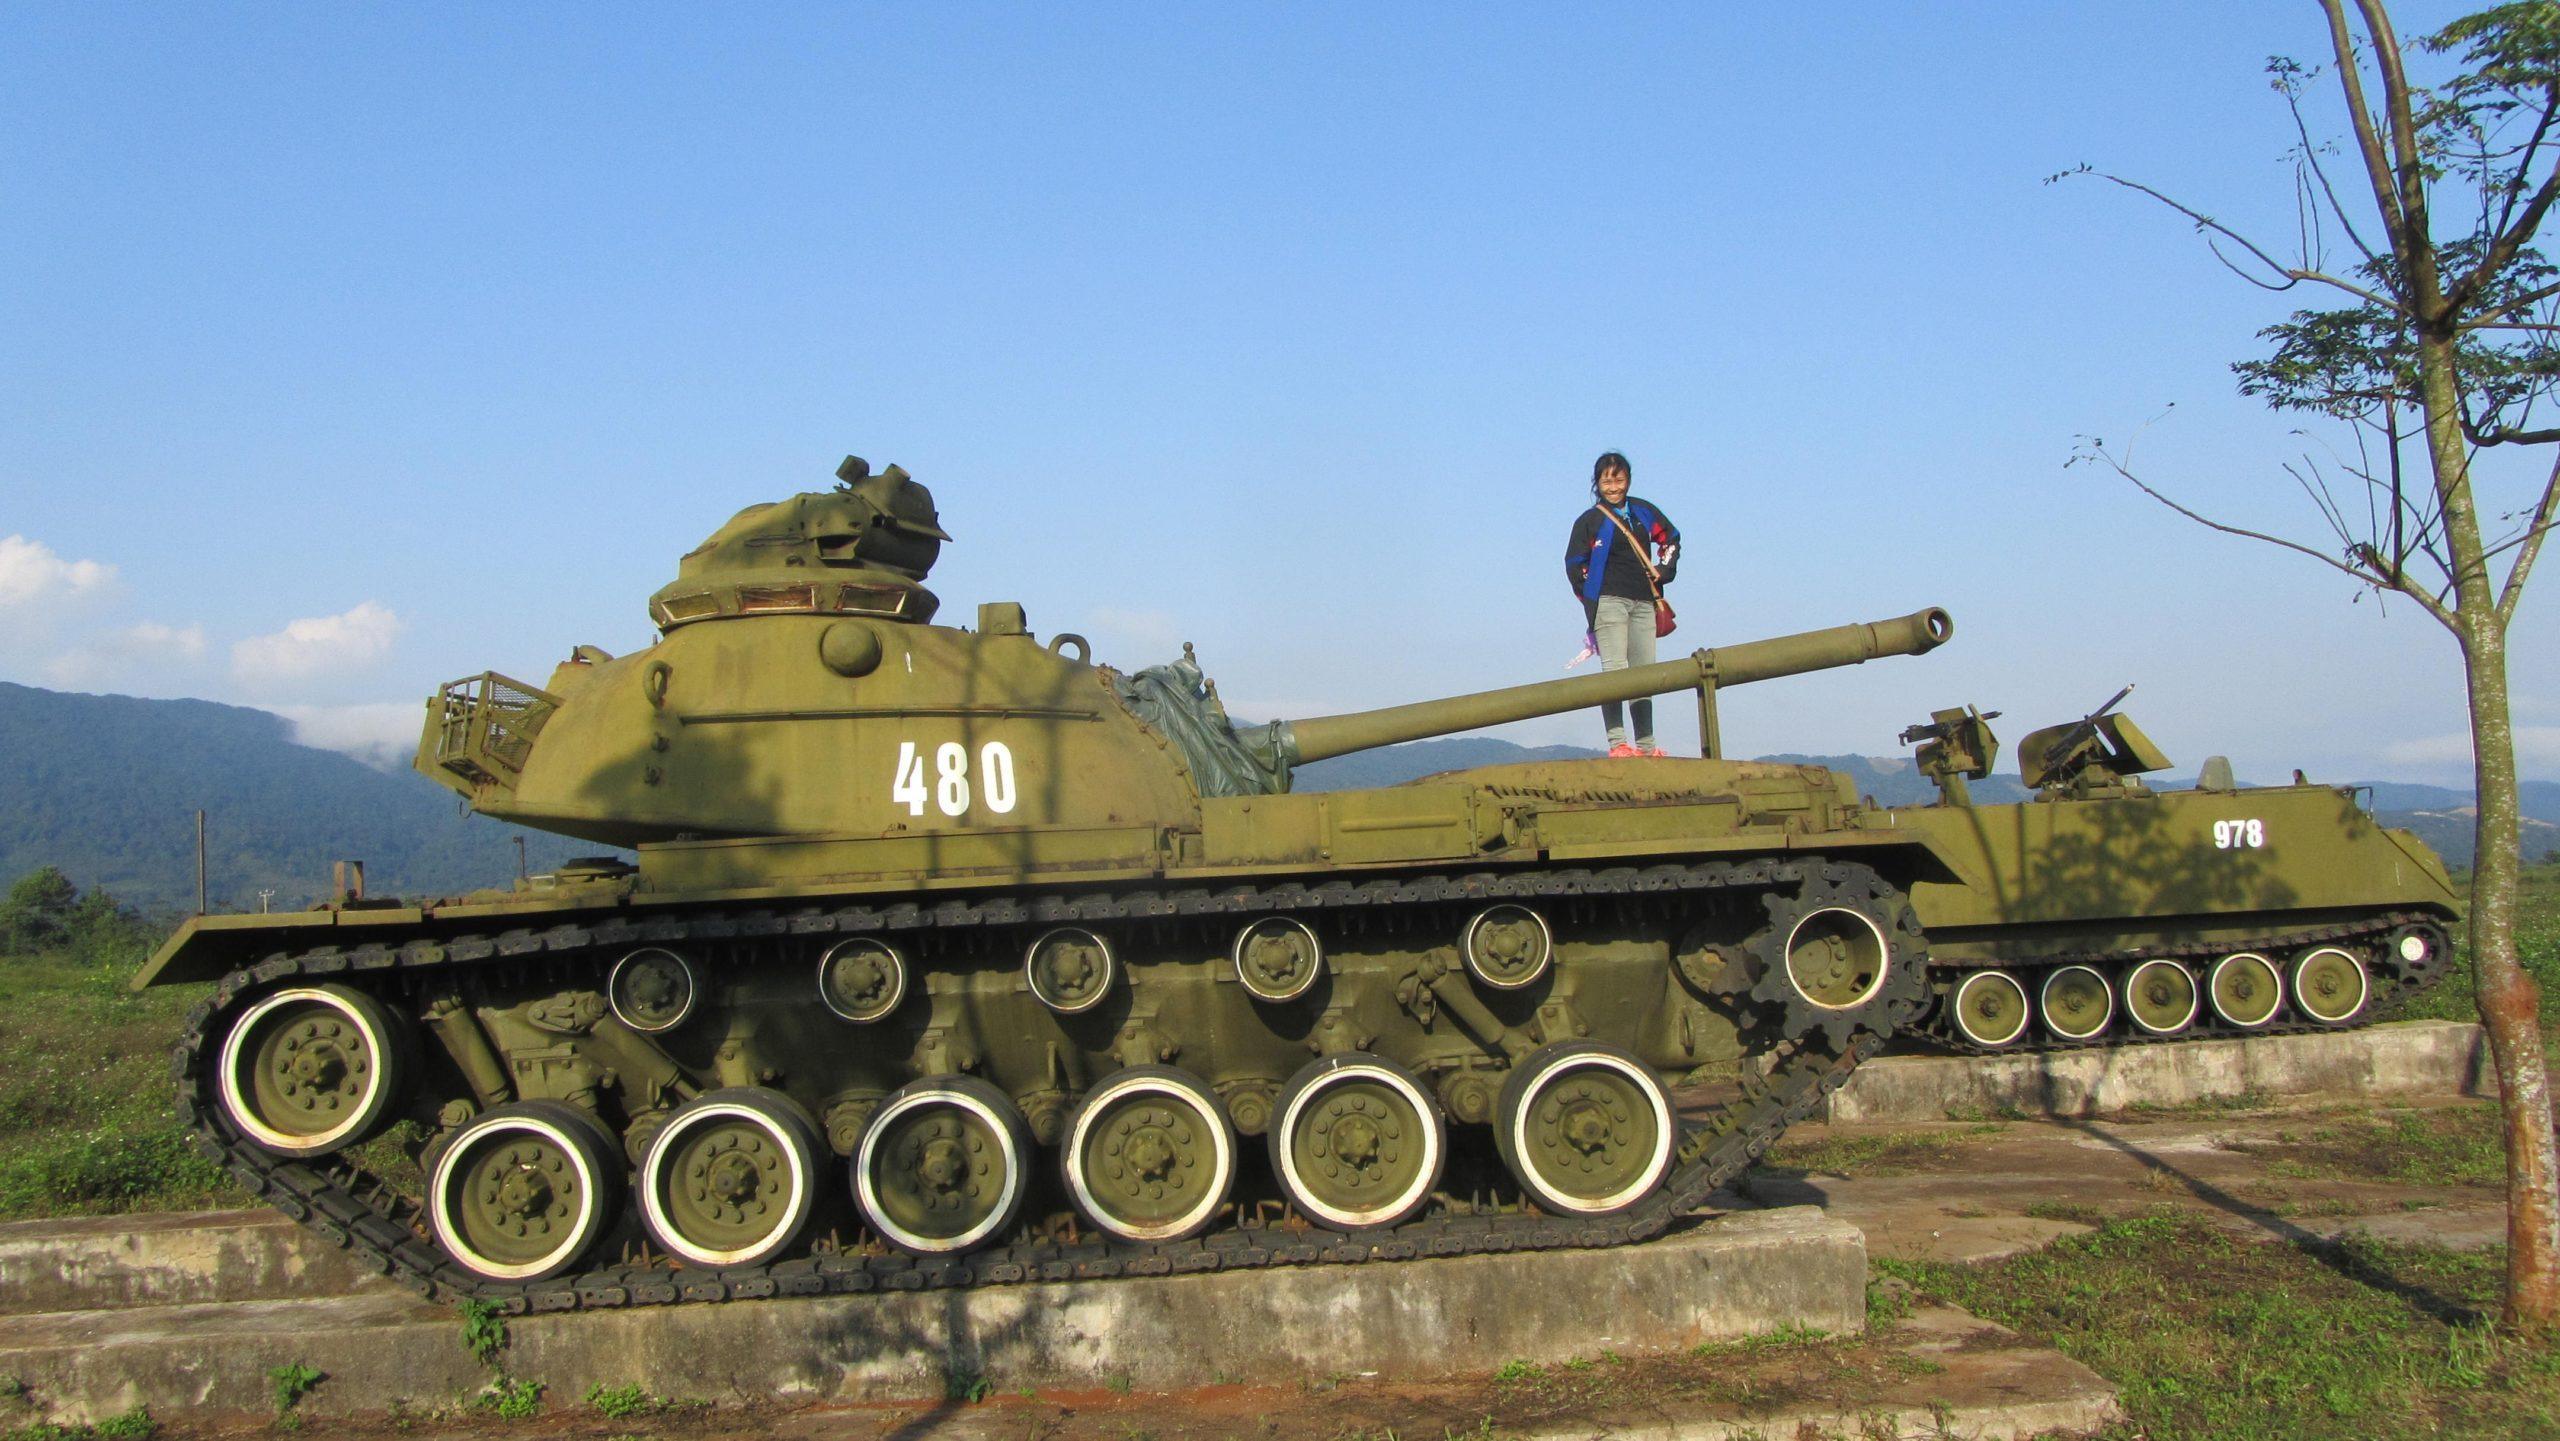 Khe Sanh tank